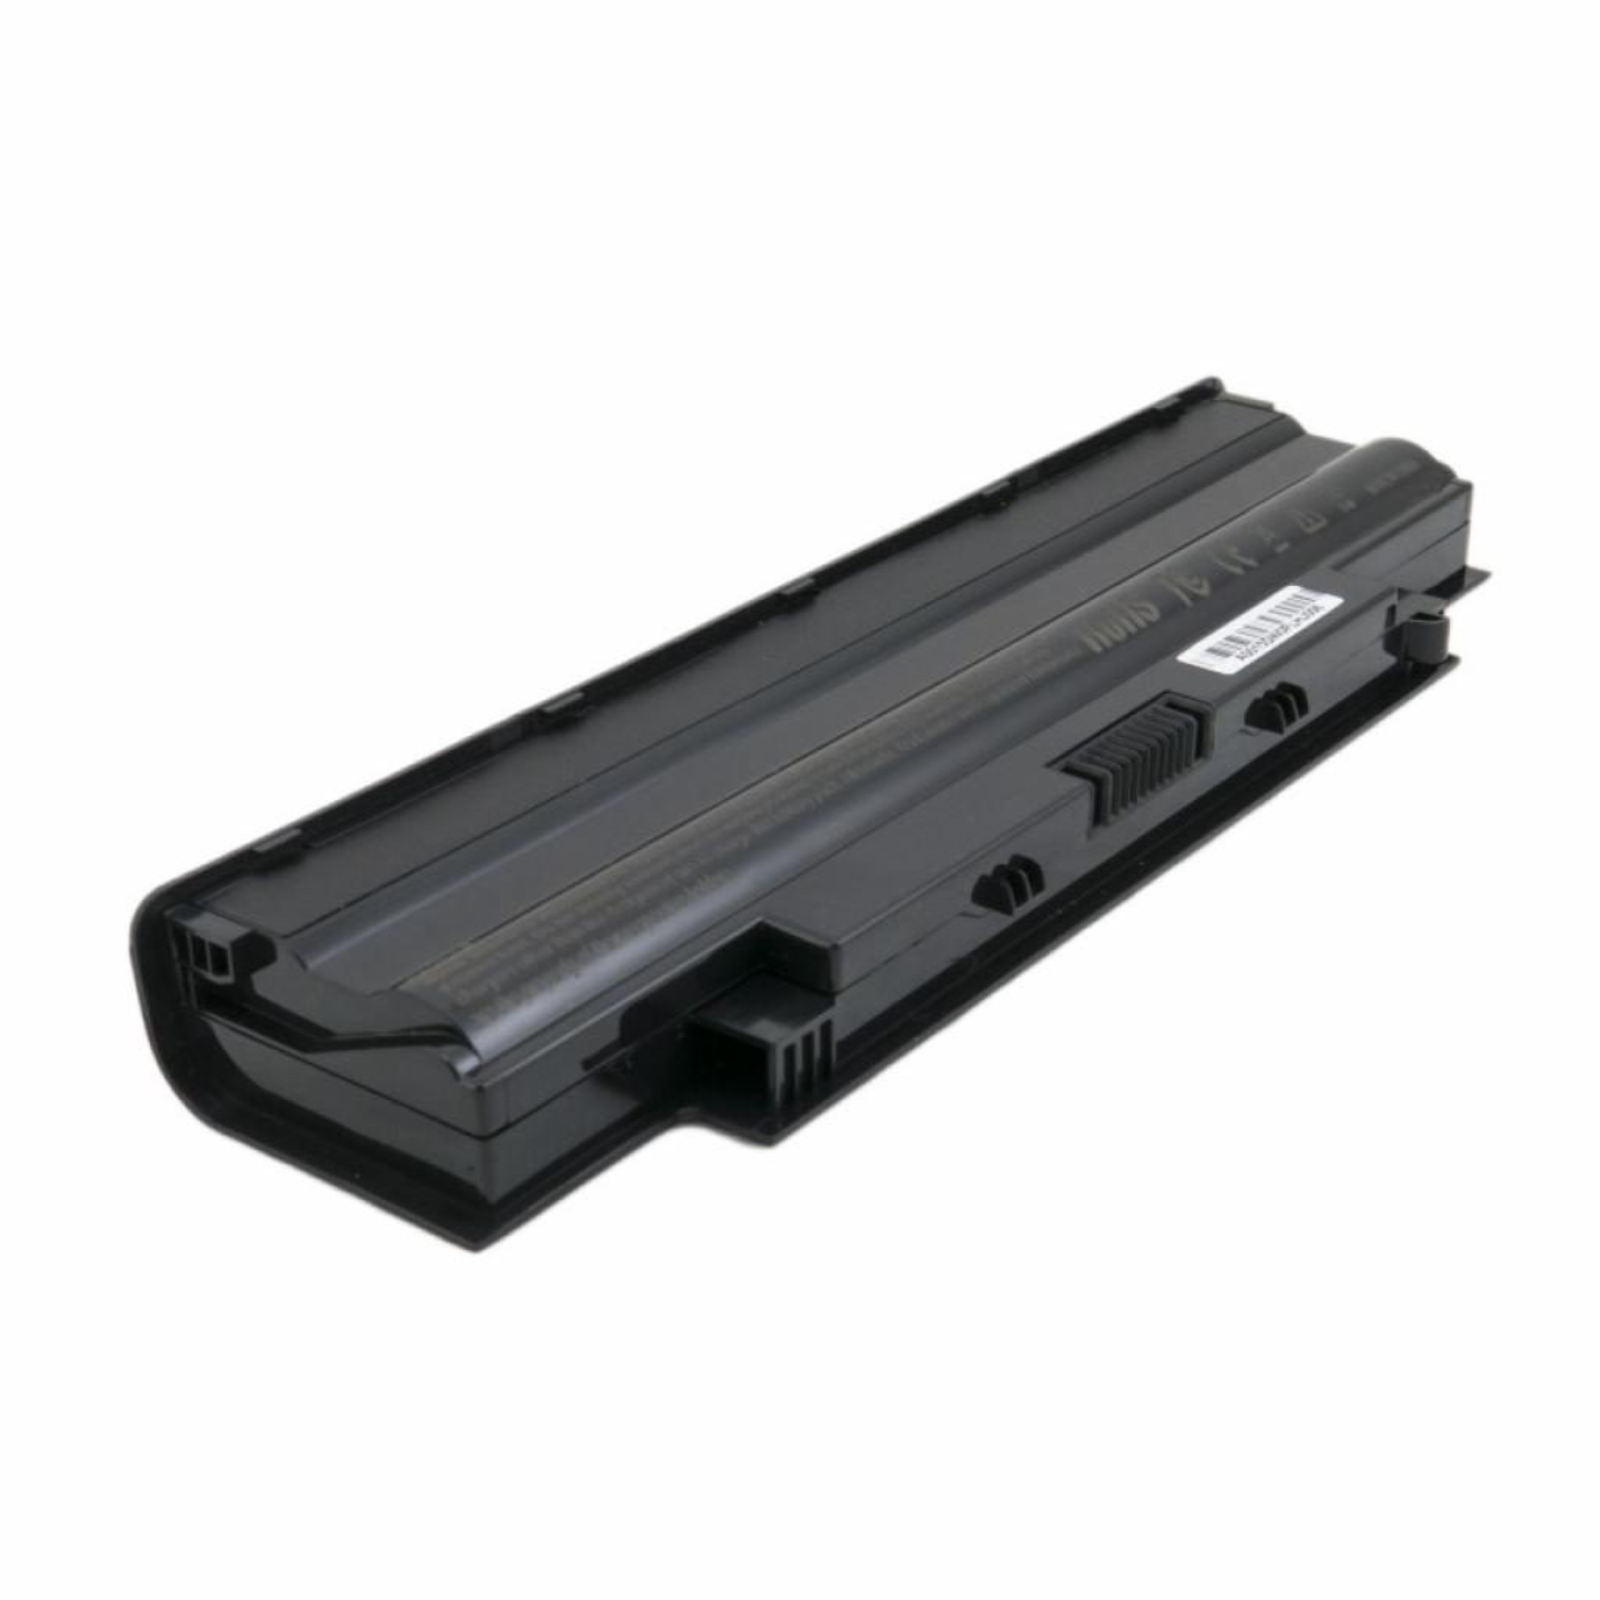 Аккумулятор для ноутбука Dell Inspiron N4010, 5200mAh EXTRADIGITAL (BND3934) изображение 2